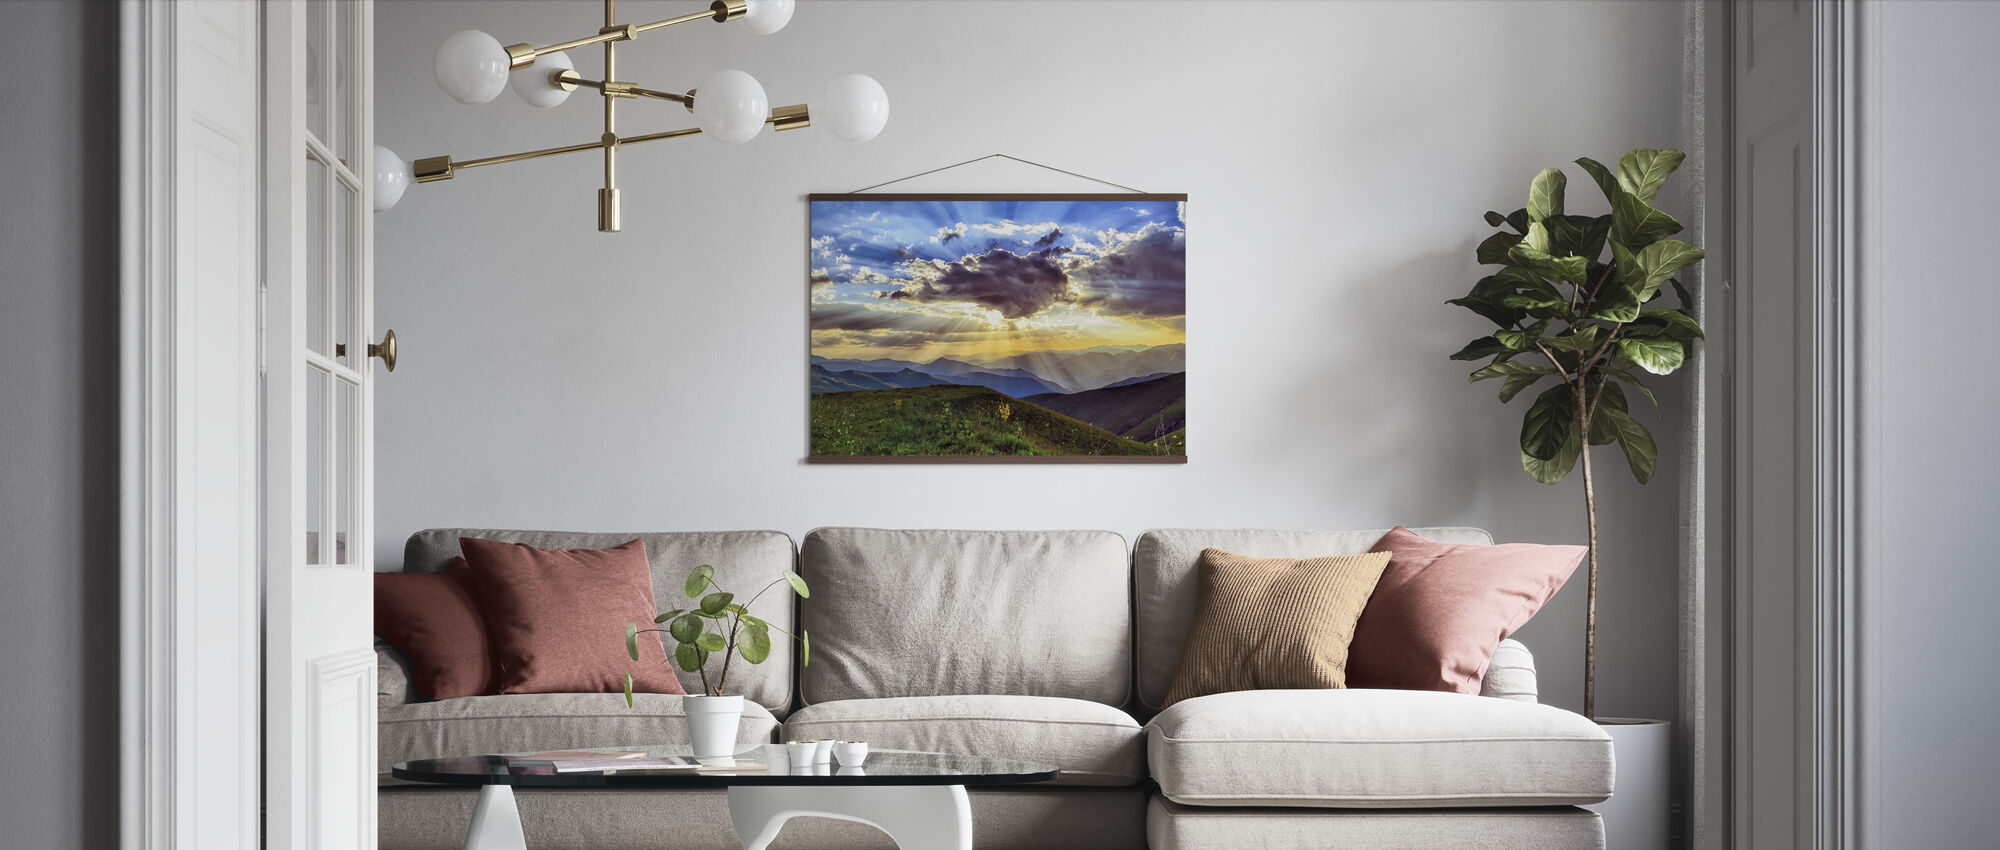 Highland Sunset - Poster - Living Room